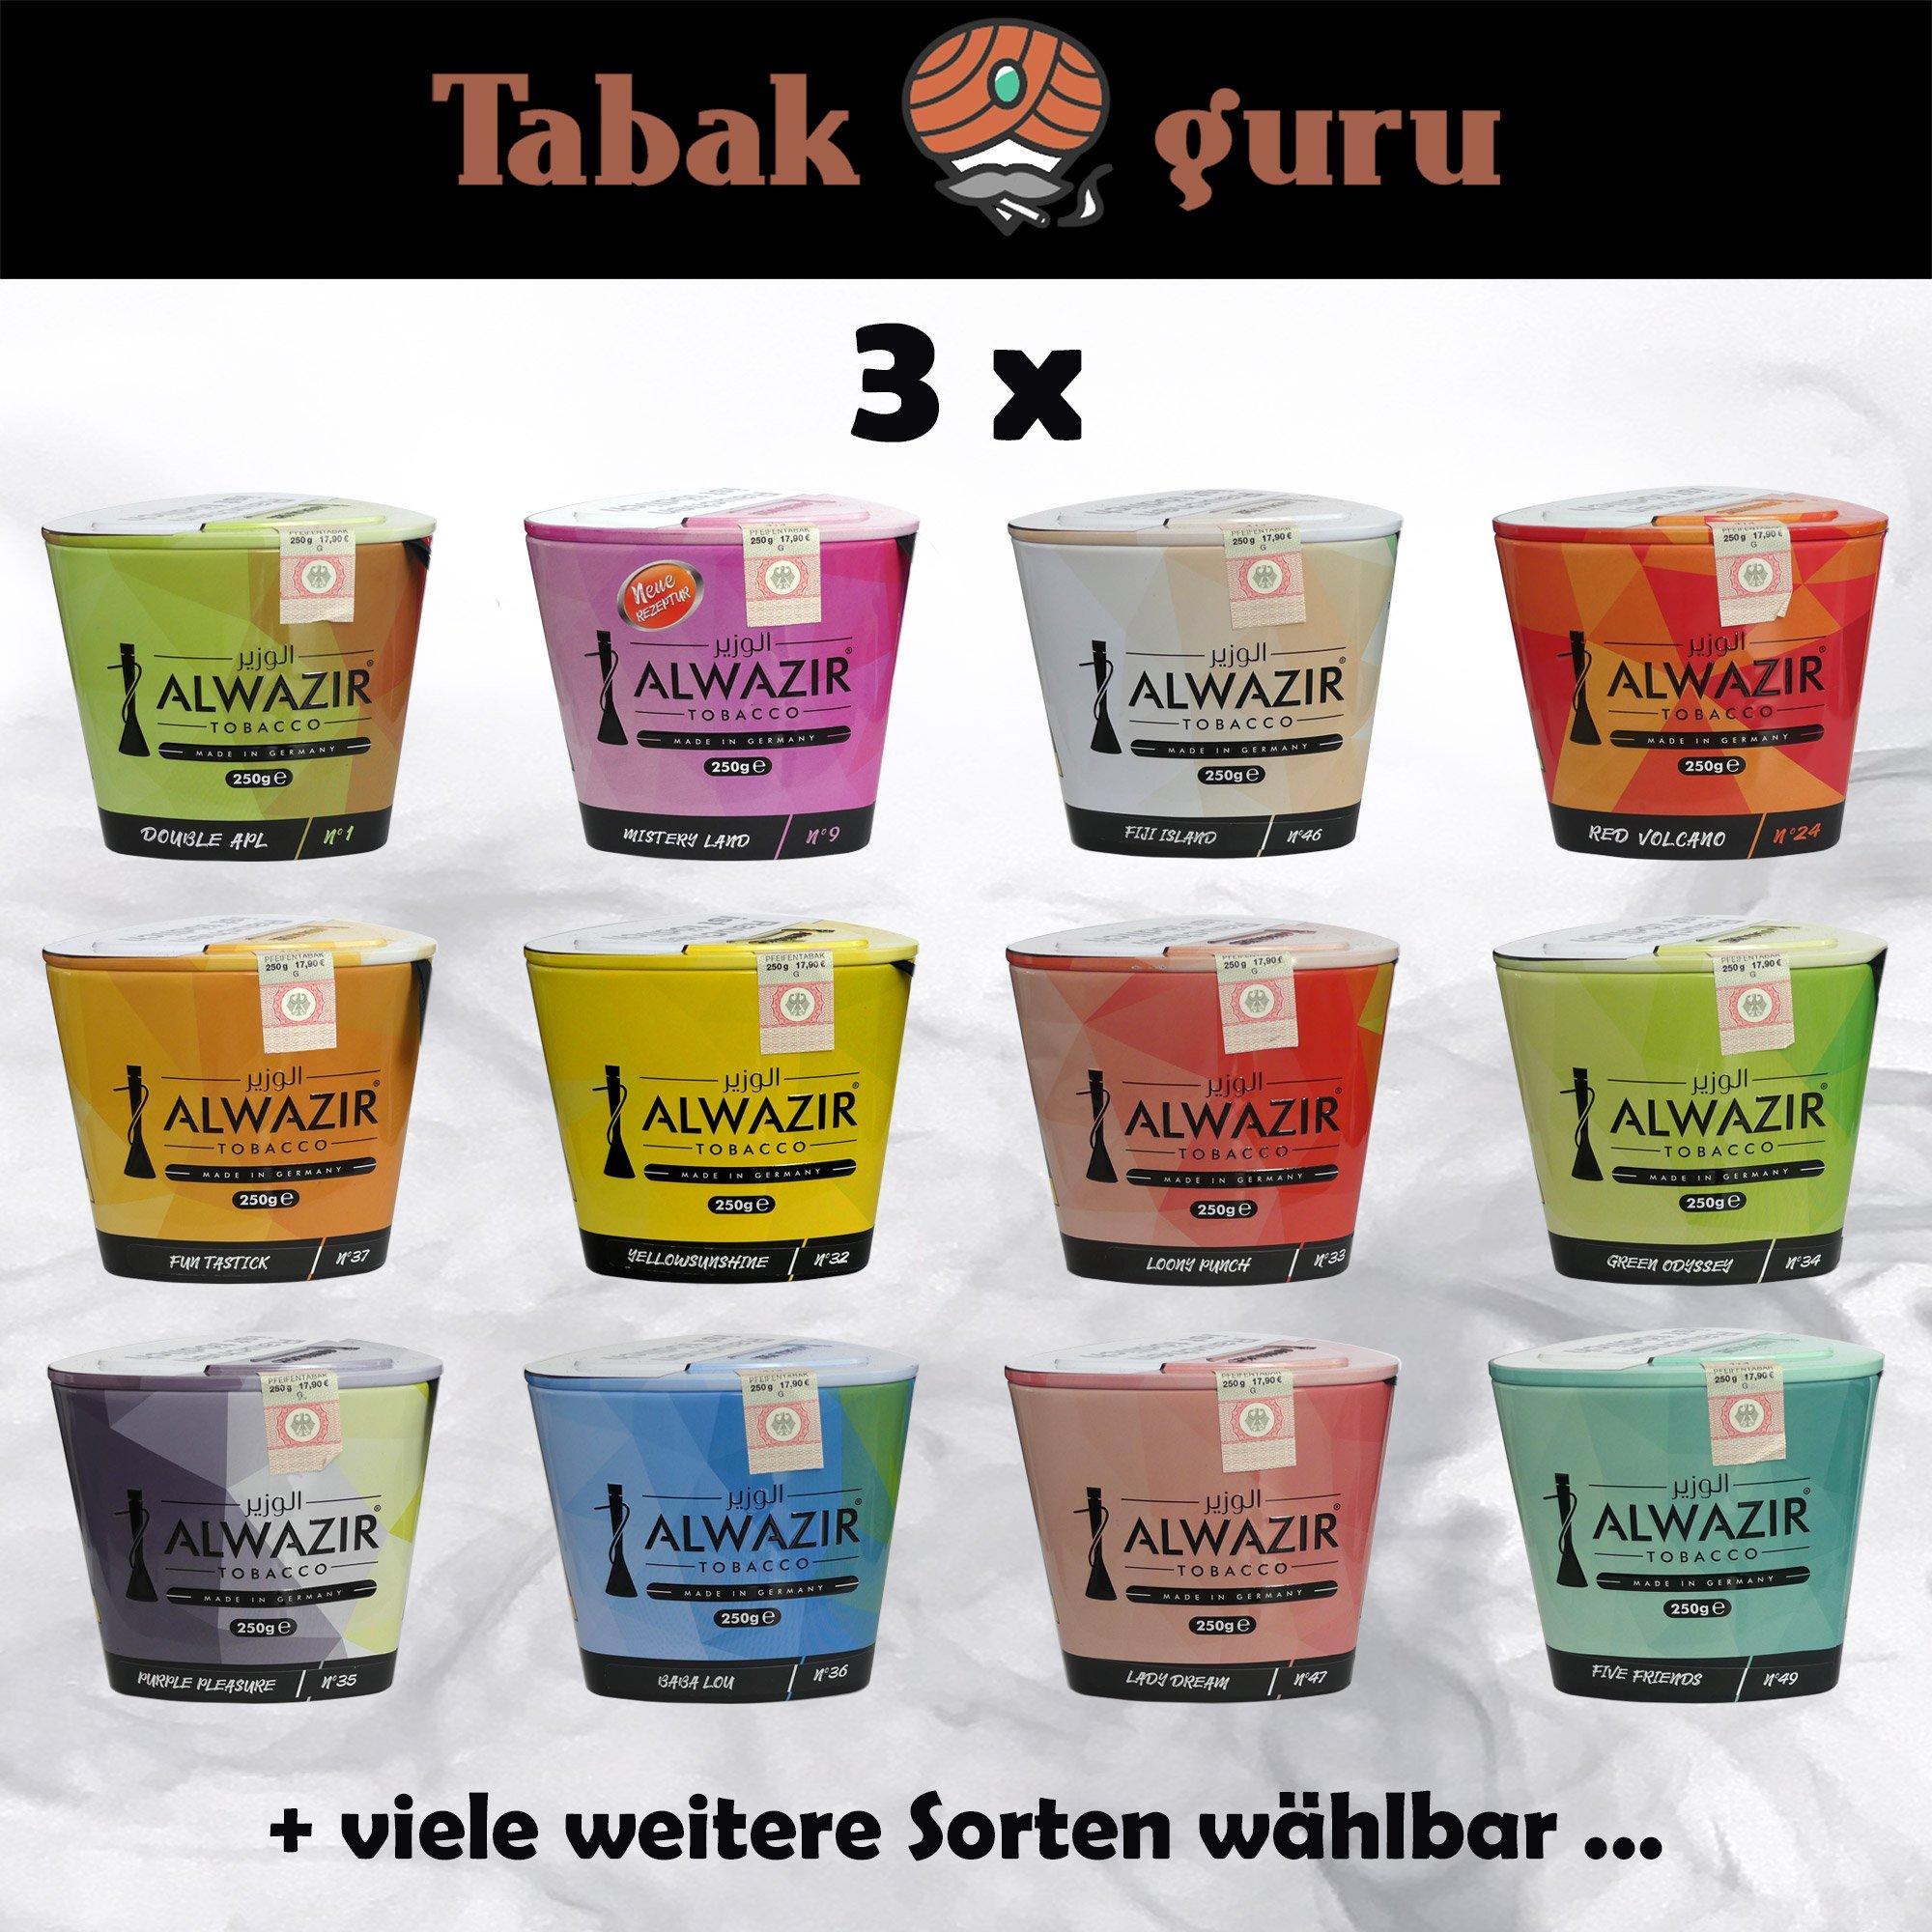 3 Dosen Alwazir Shisha Tabak 250 g - alle Sorten wählbar